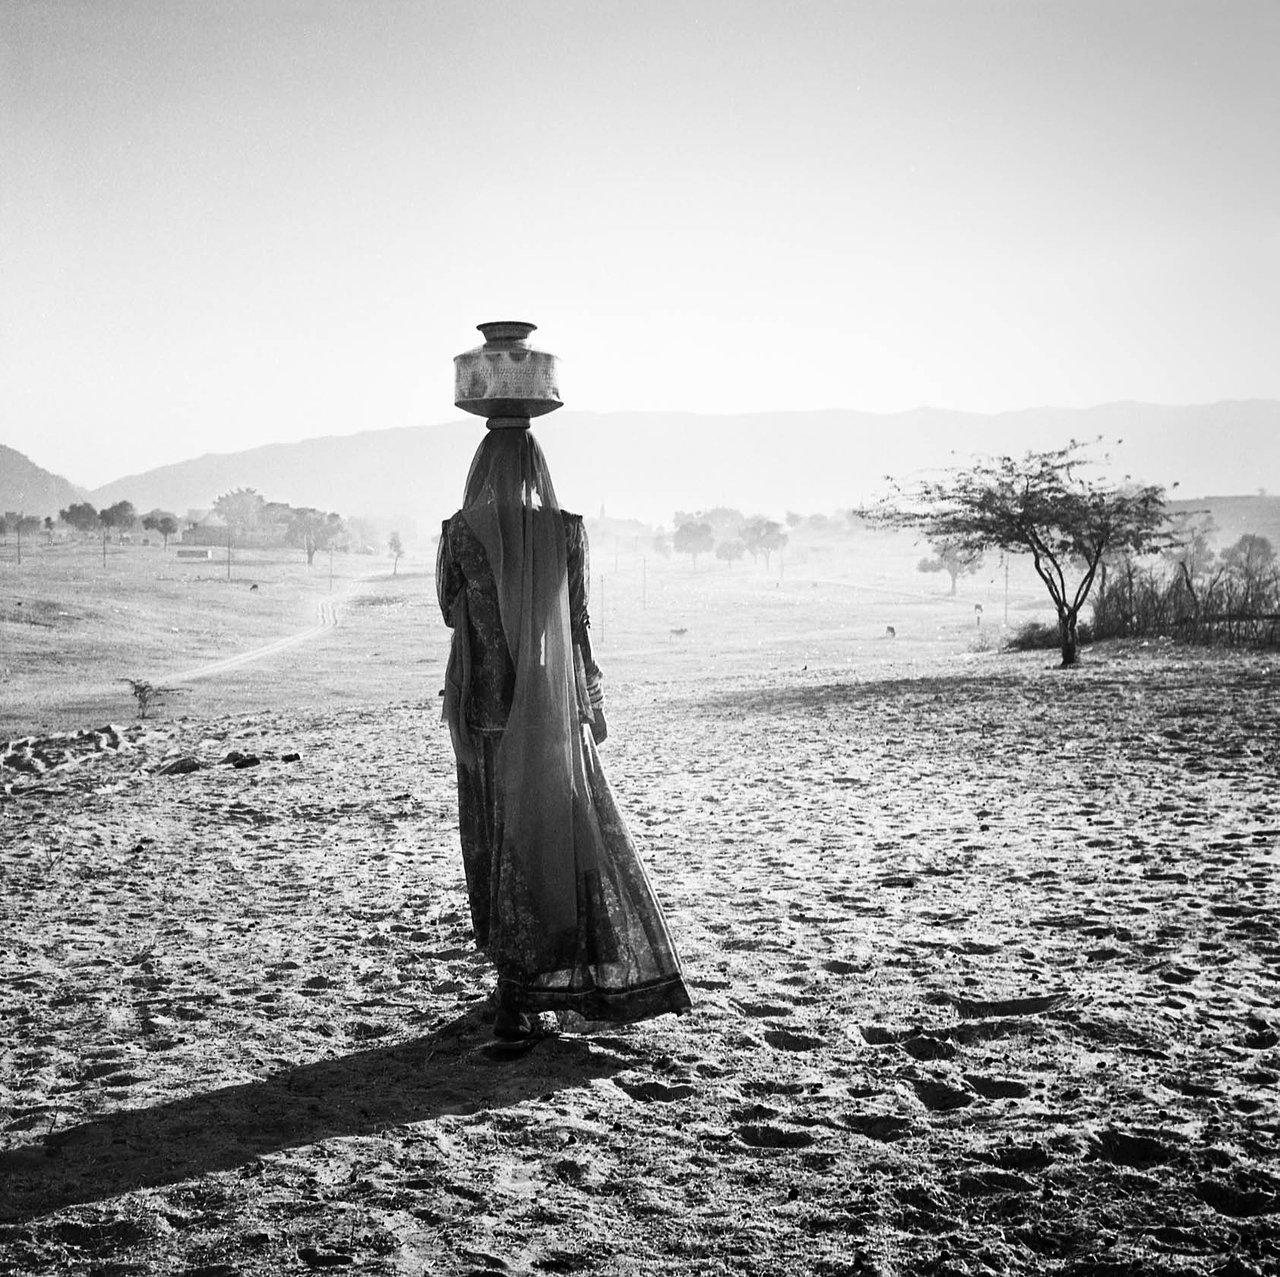 Gipsy Woman 2, Rajasthan